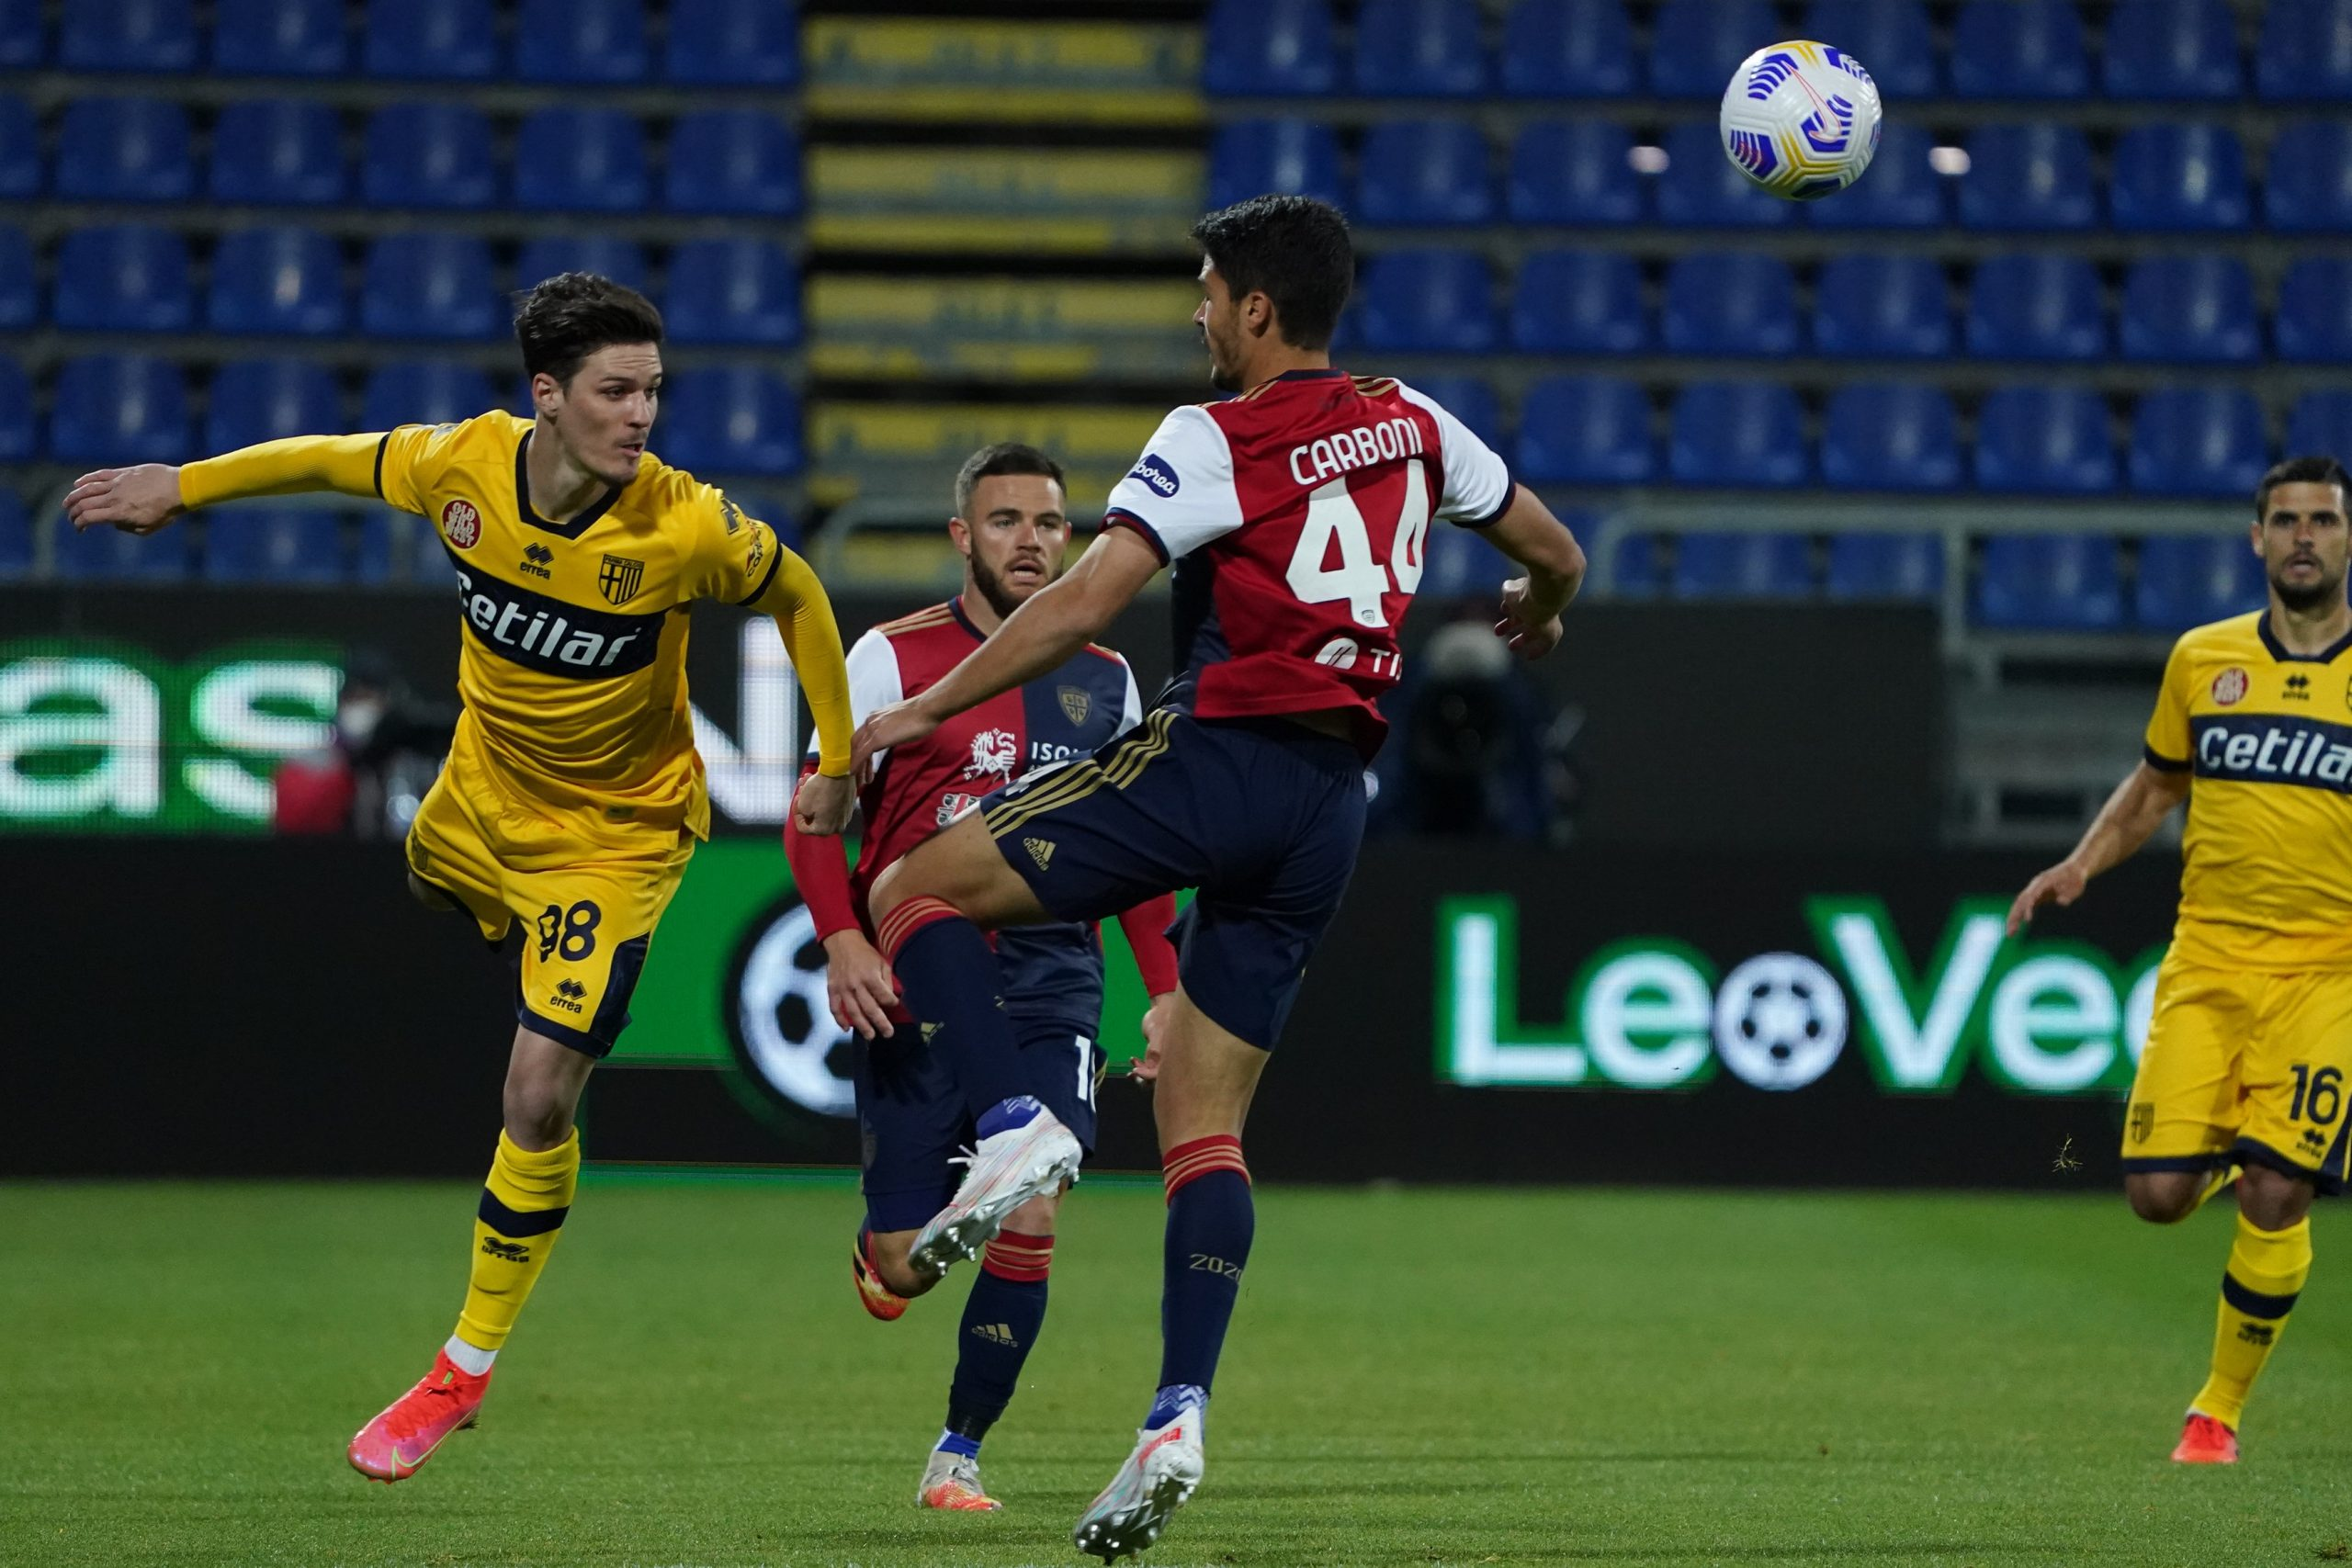 Man Parma Cagliari scaled